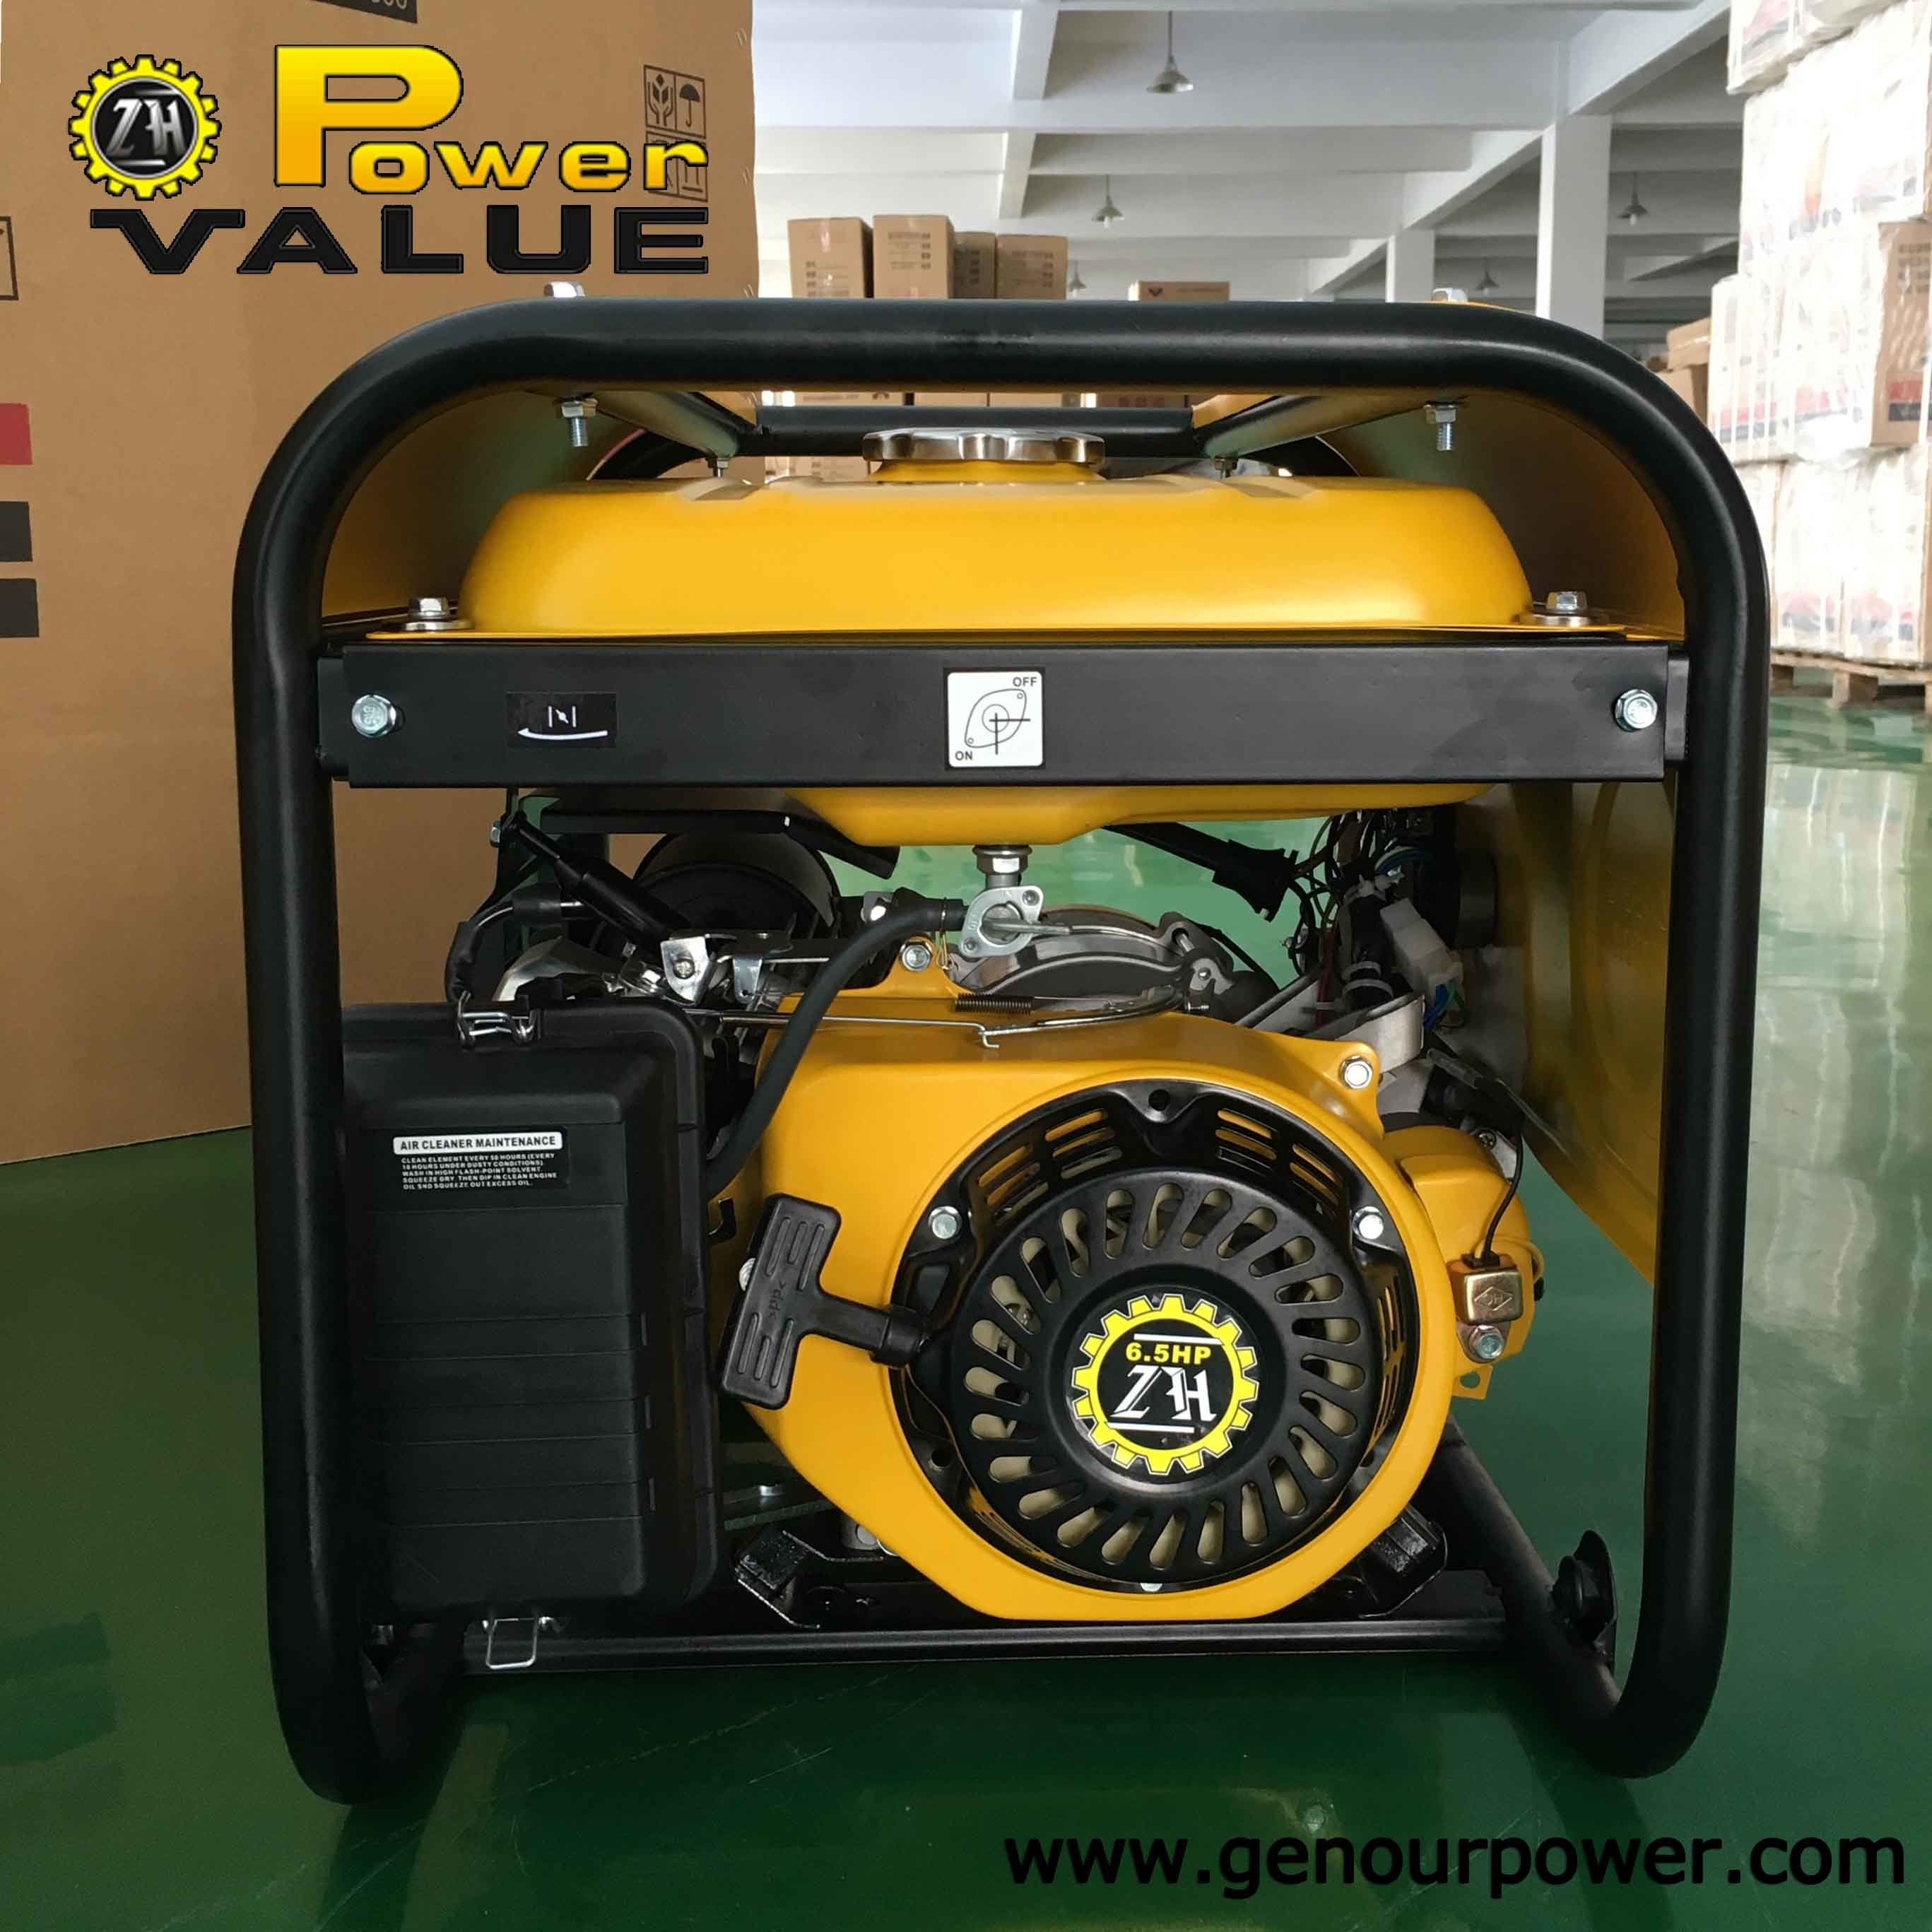 2000W 2kw 50Hz 220V Gx160 Engine Portable Petrol Electric Generator